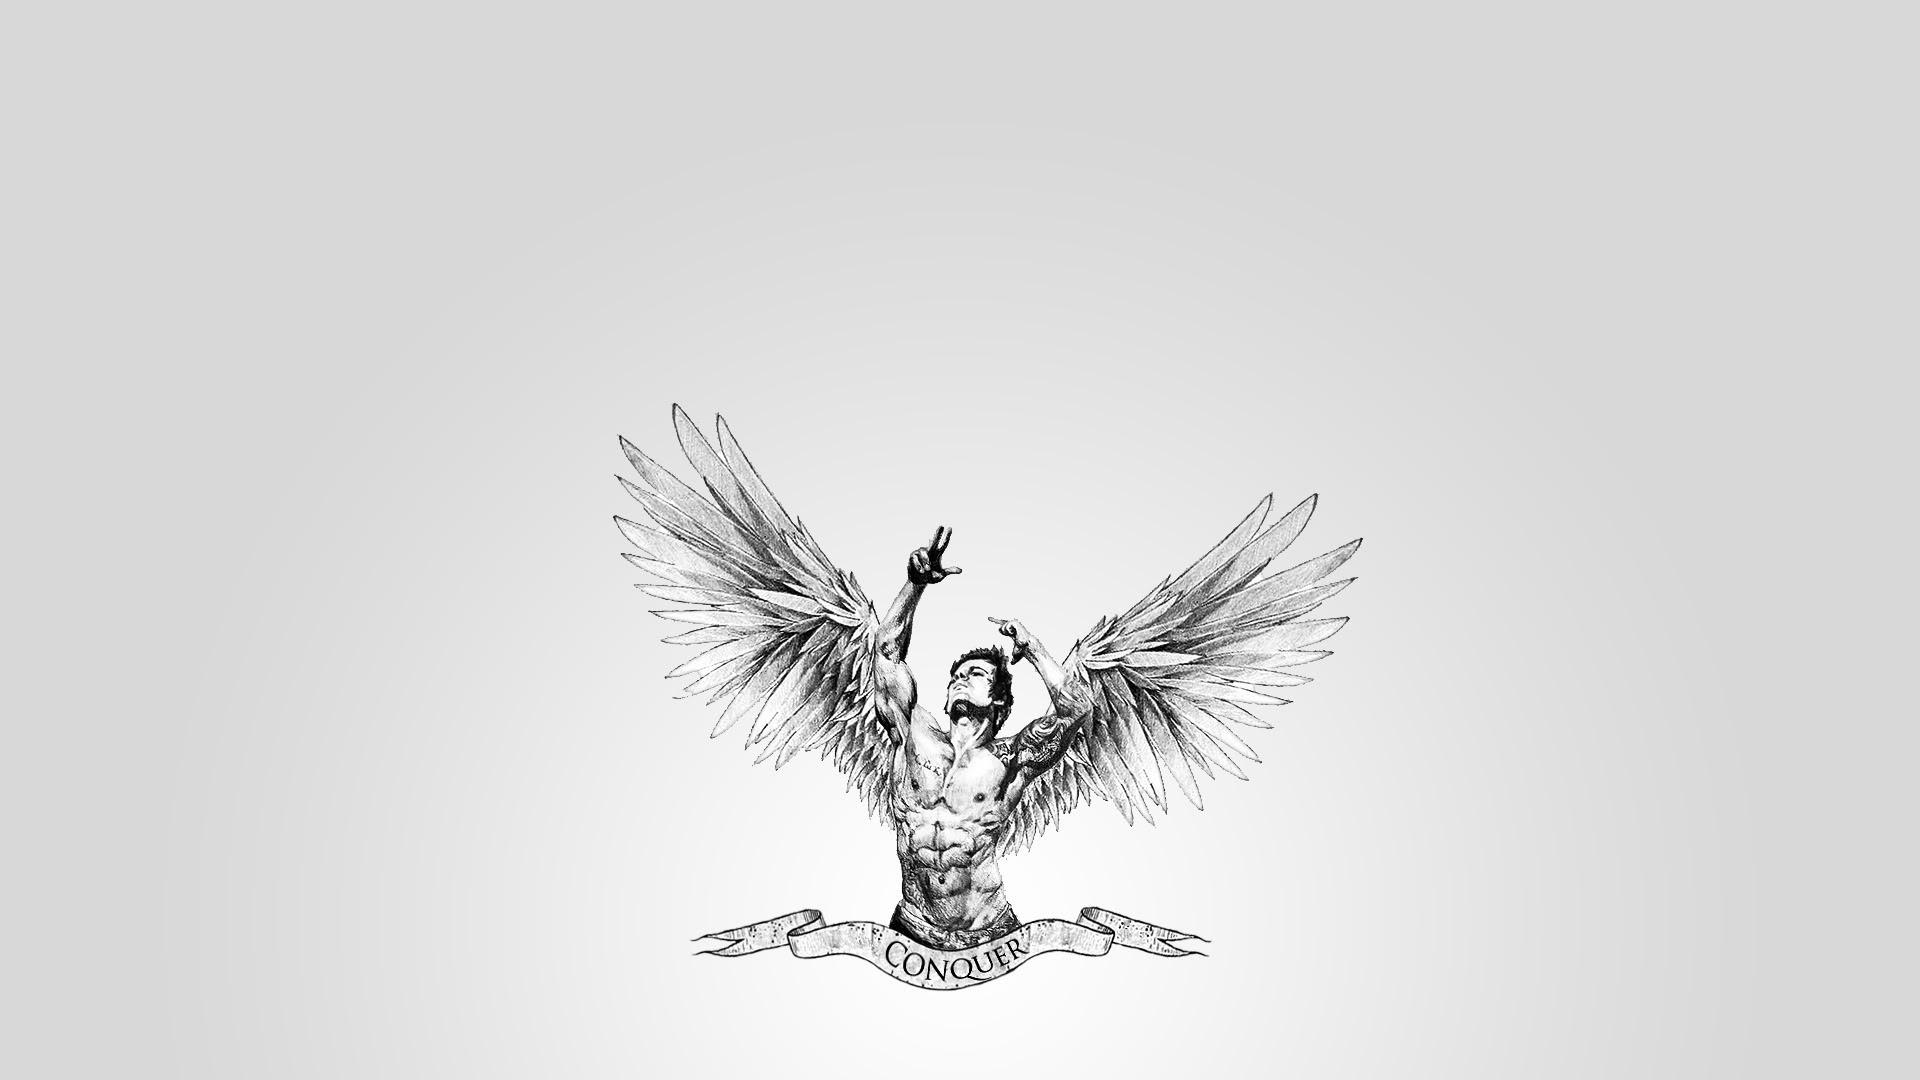 Wallpaper Gambar Ilustrasi Burung Buas Burung Rajawali